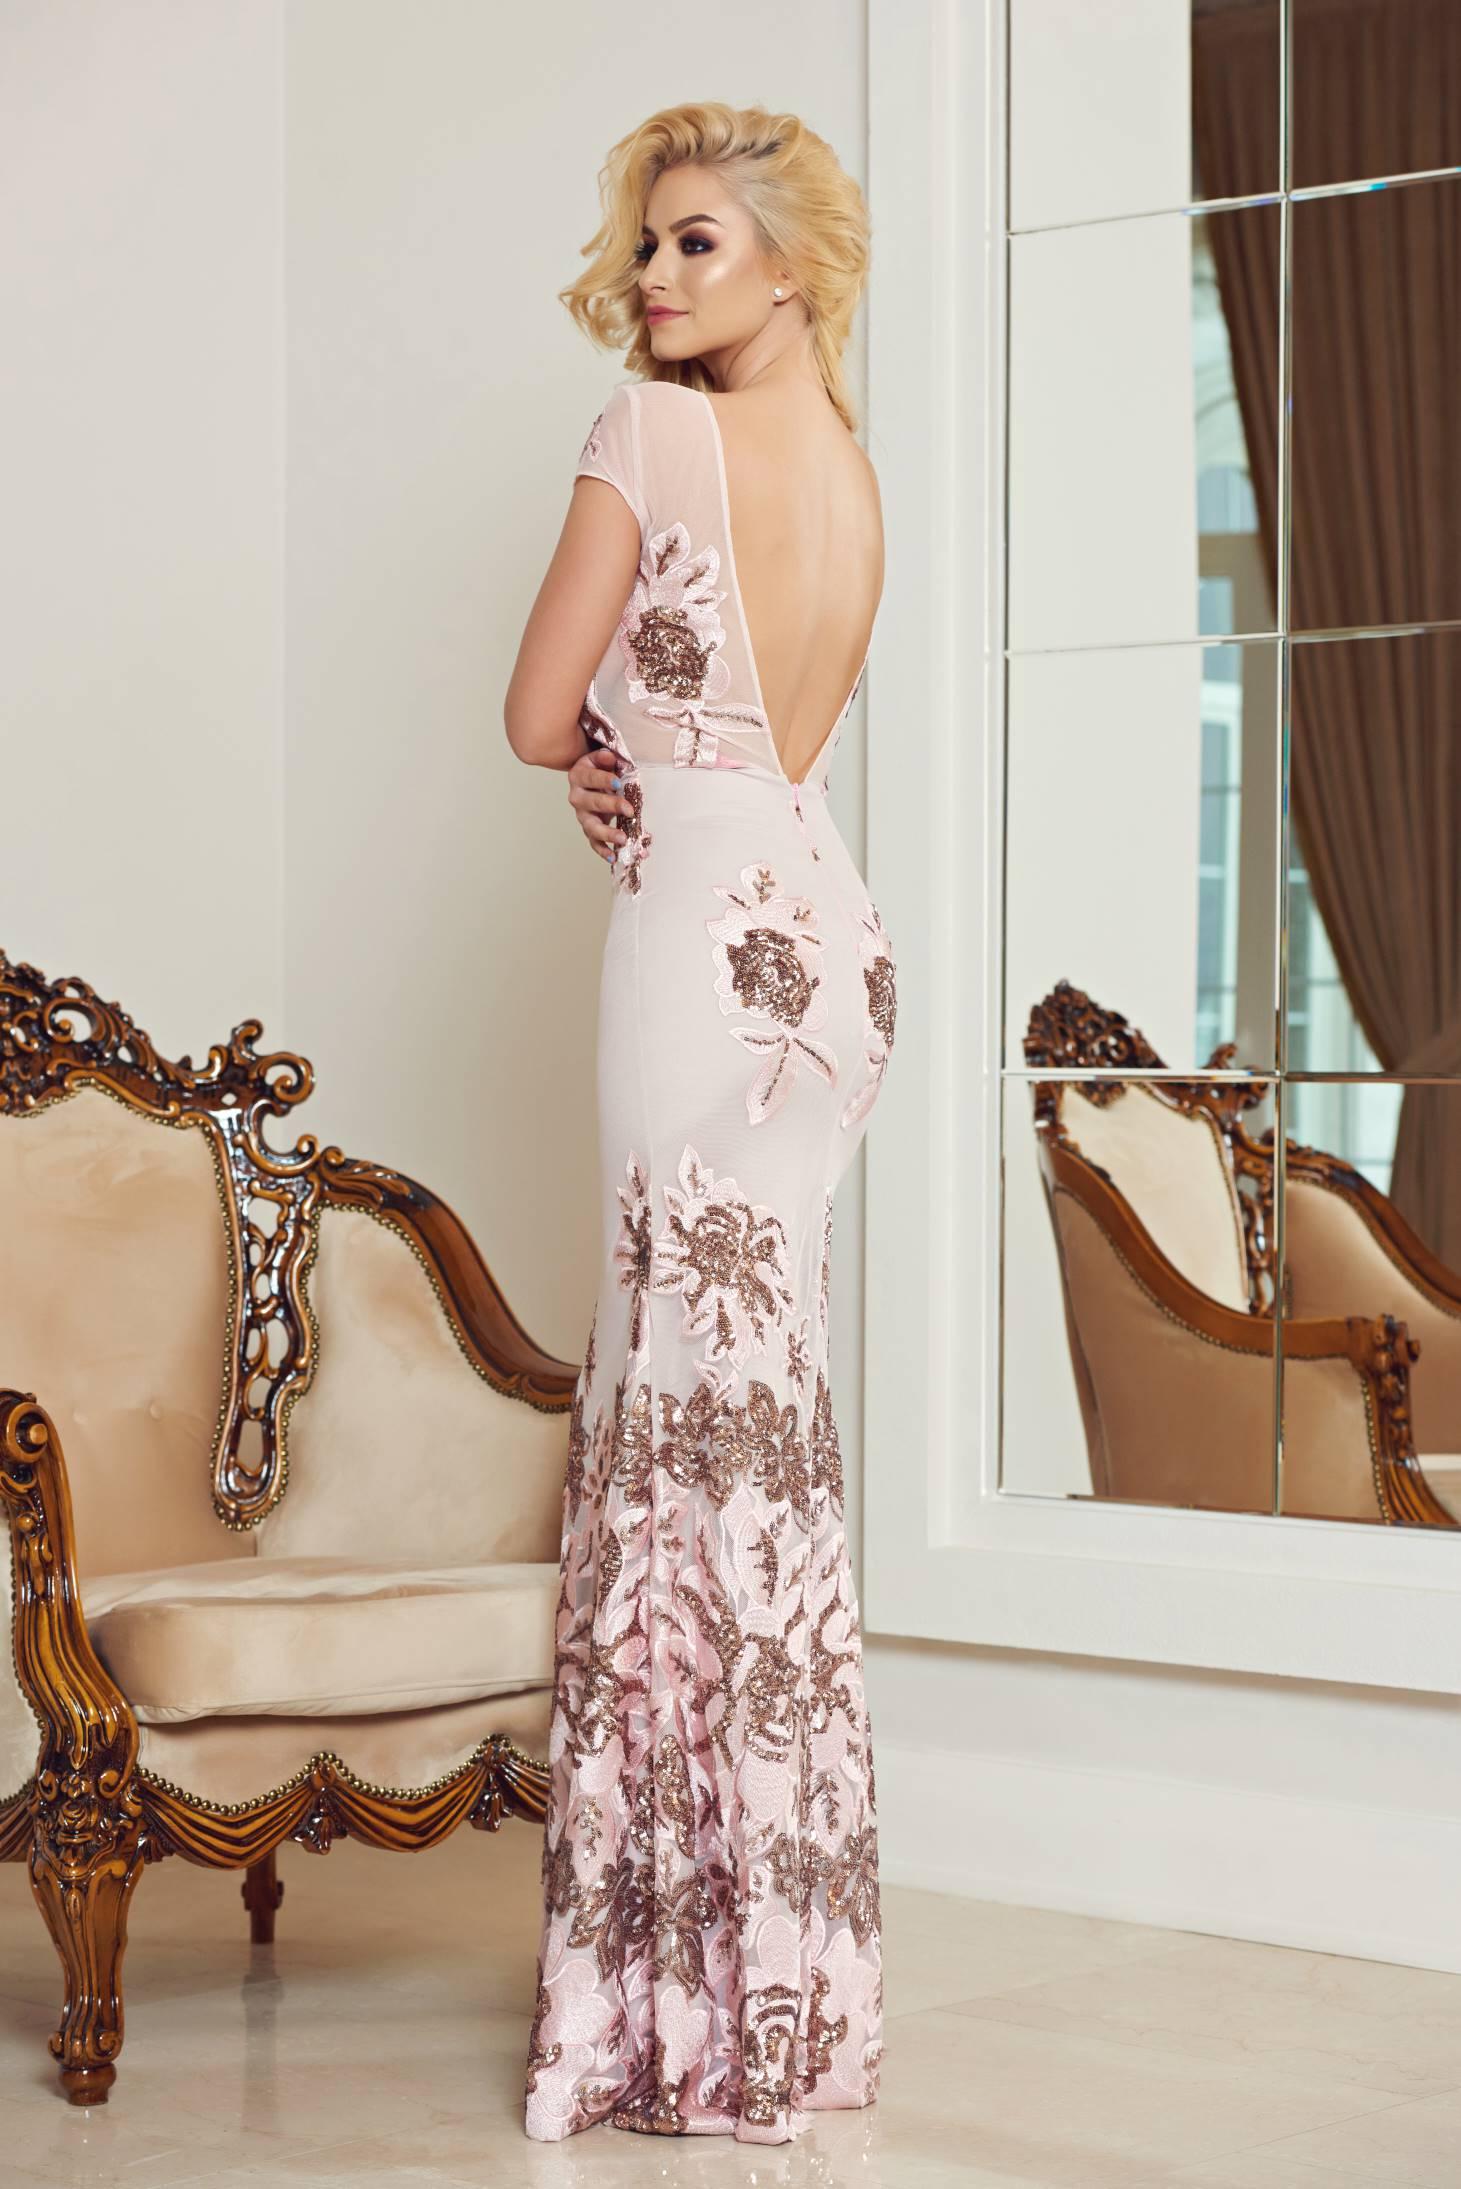 StarShinerS rosa bareback mermaid dress with sequin embellished details